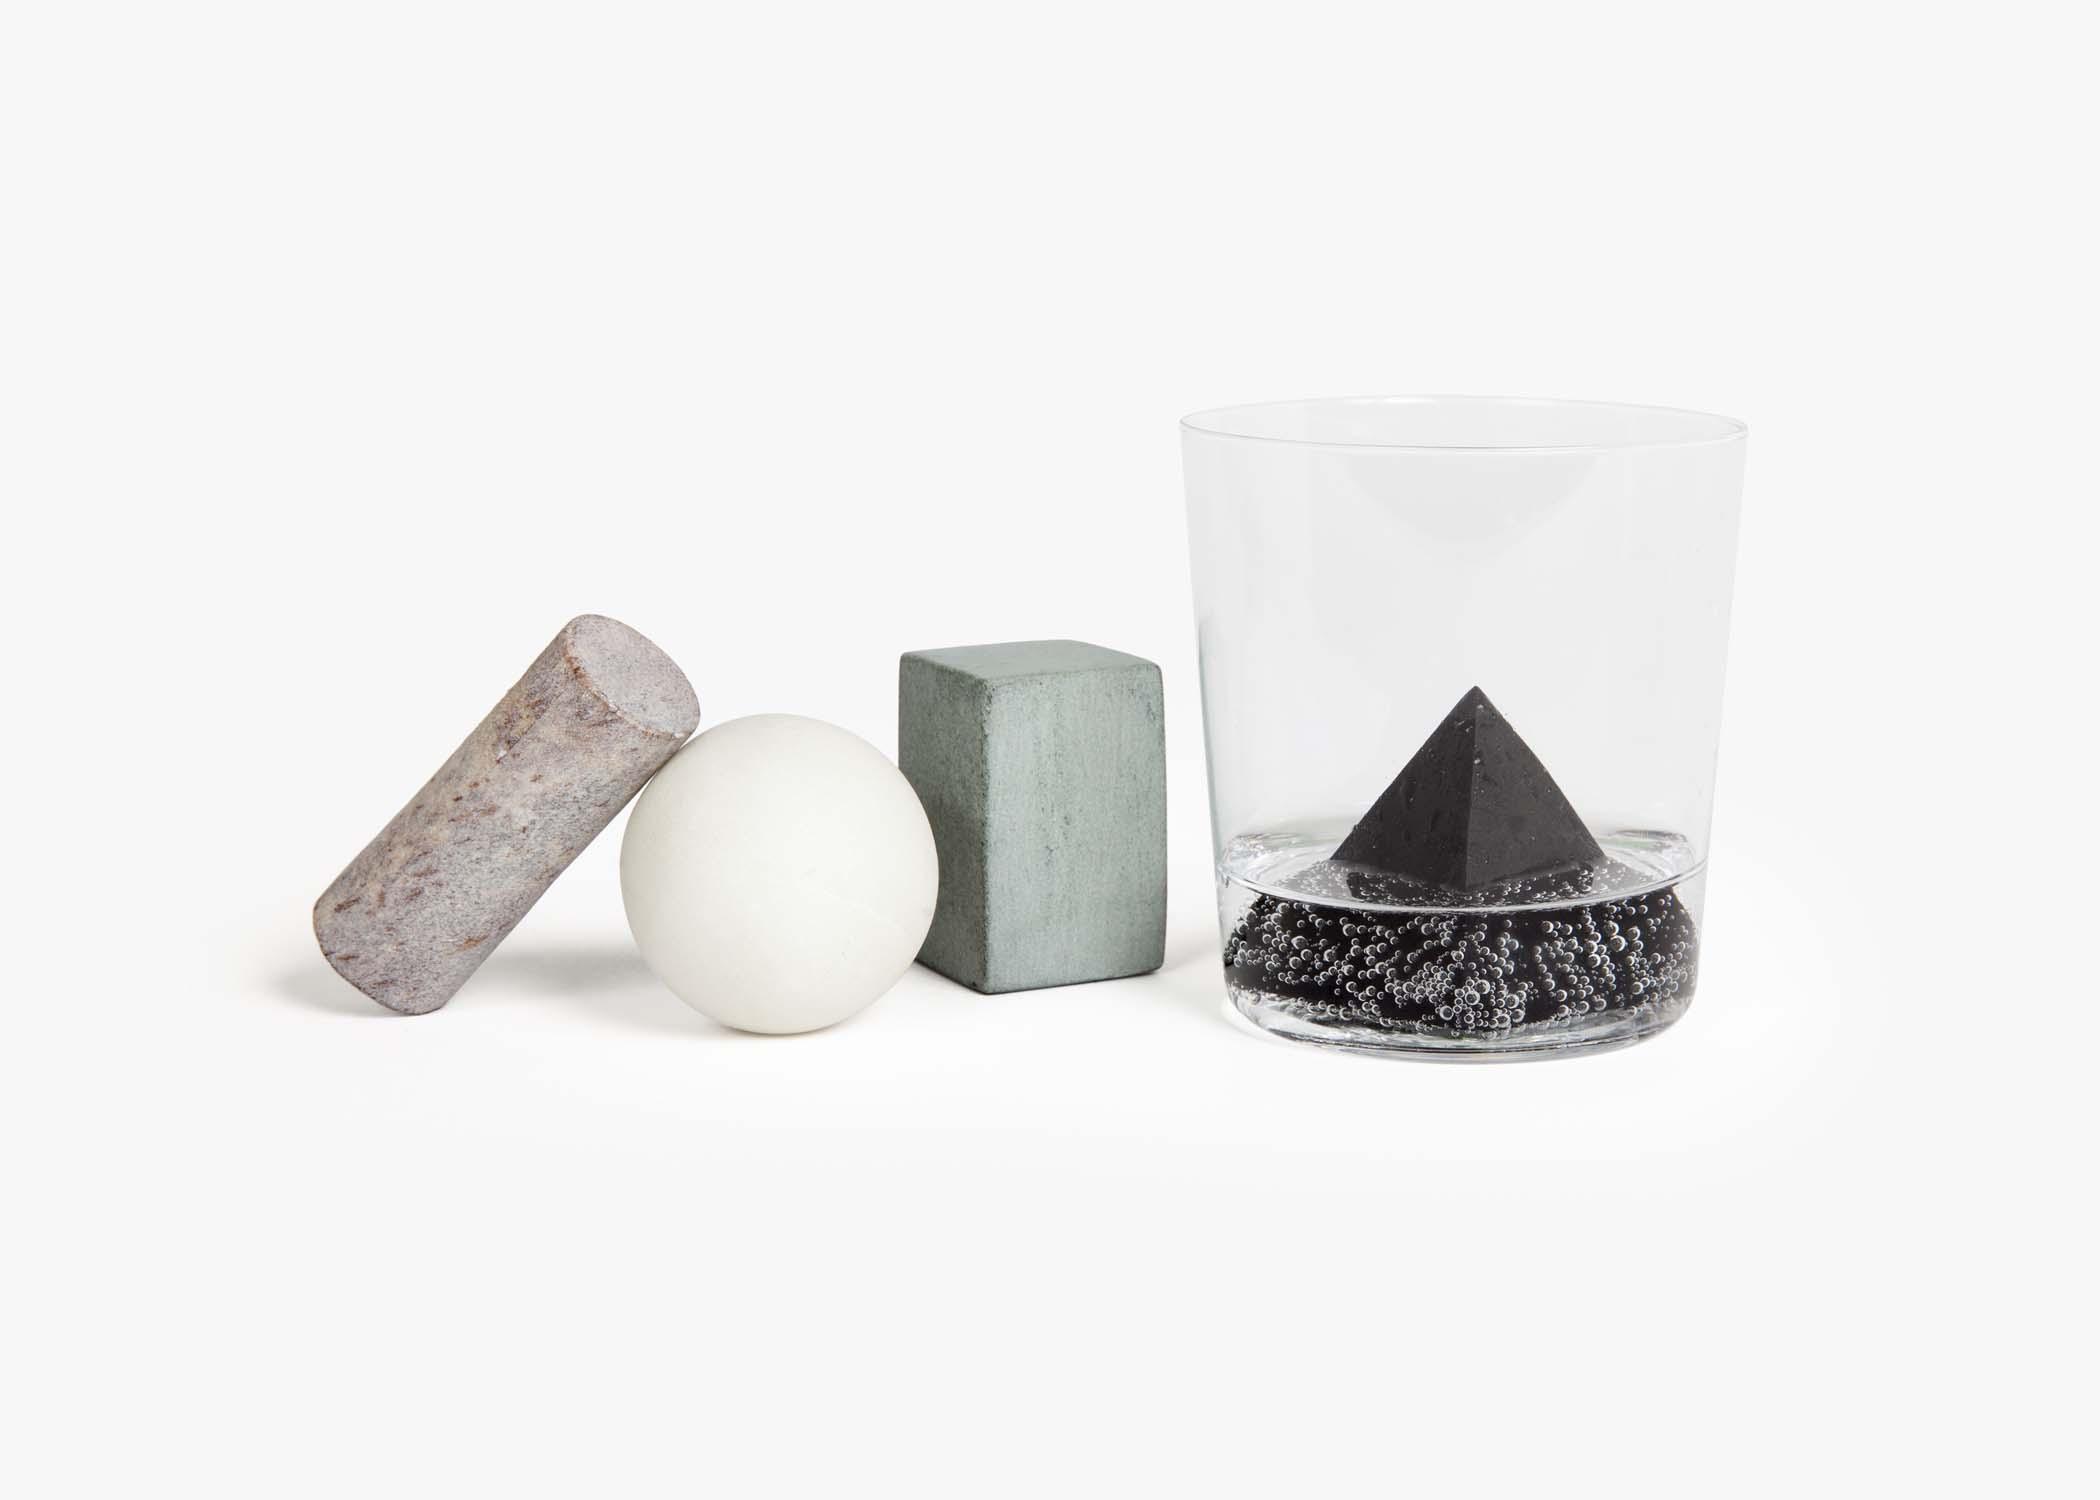 dailybasics_kitchen_02_cube-rocks